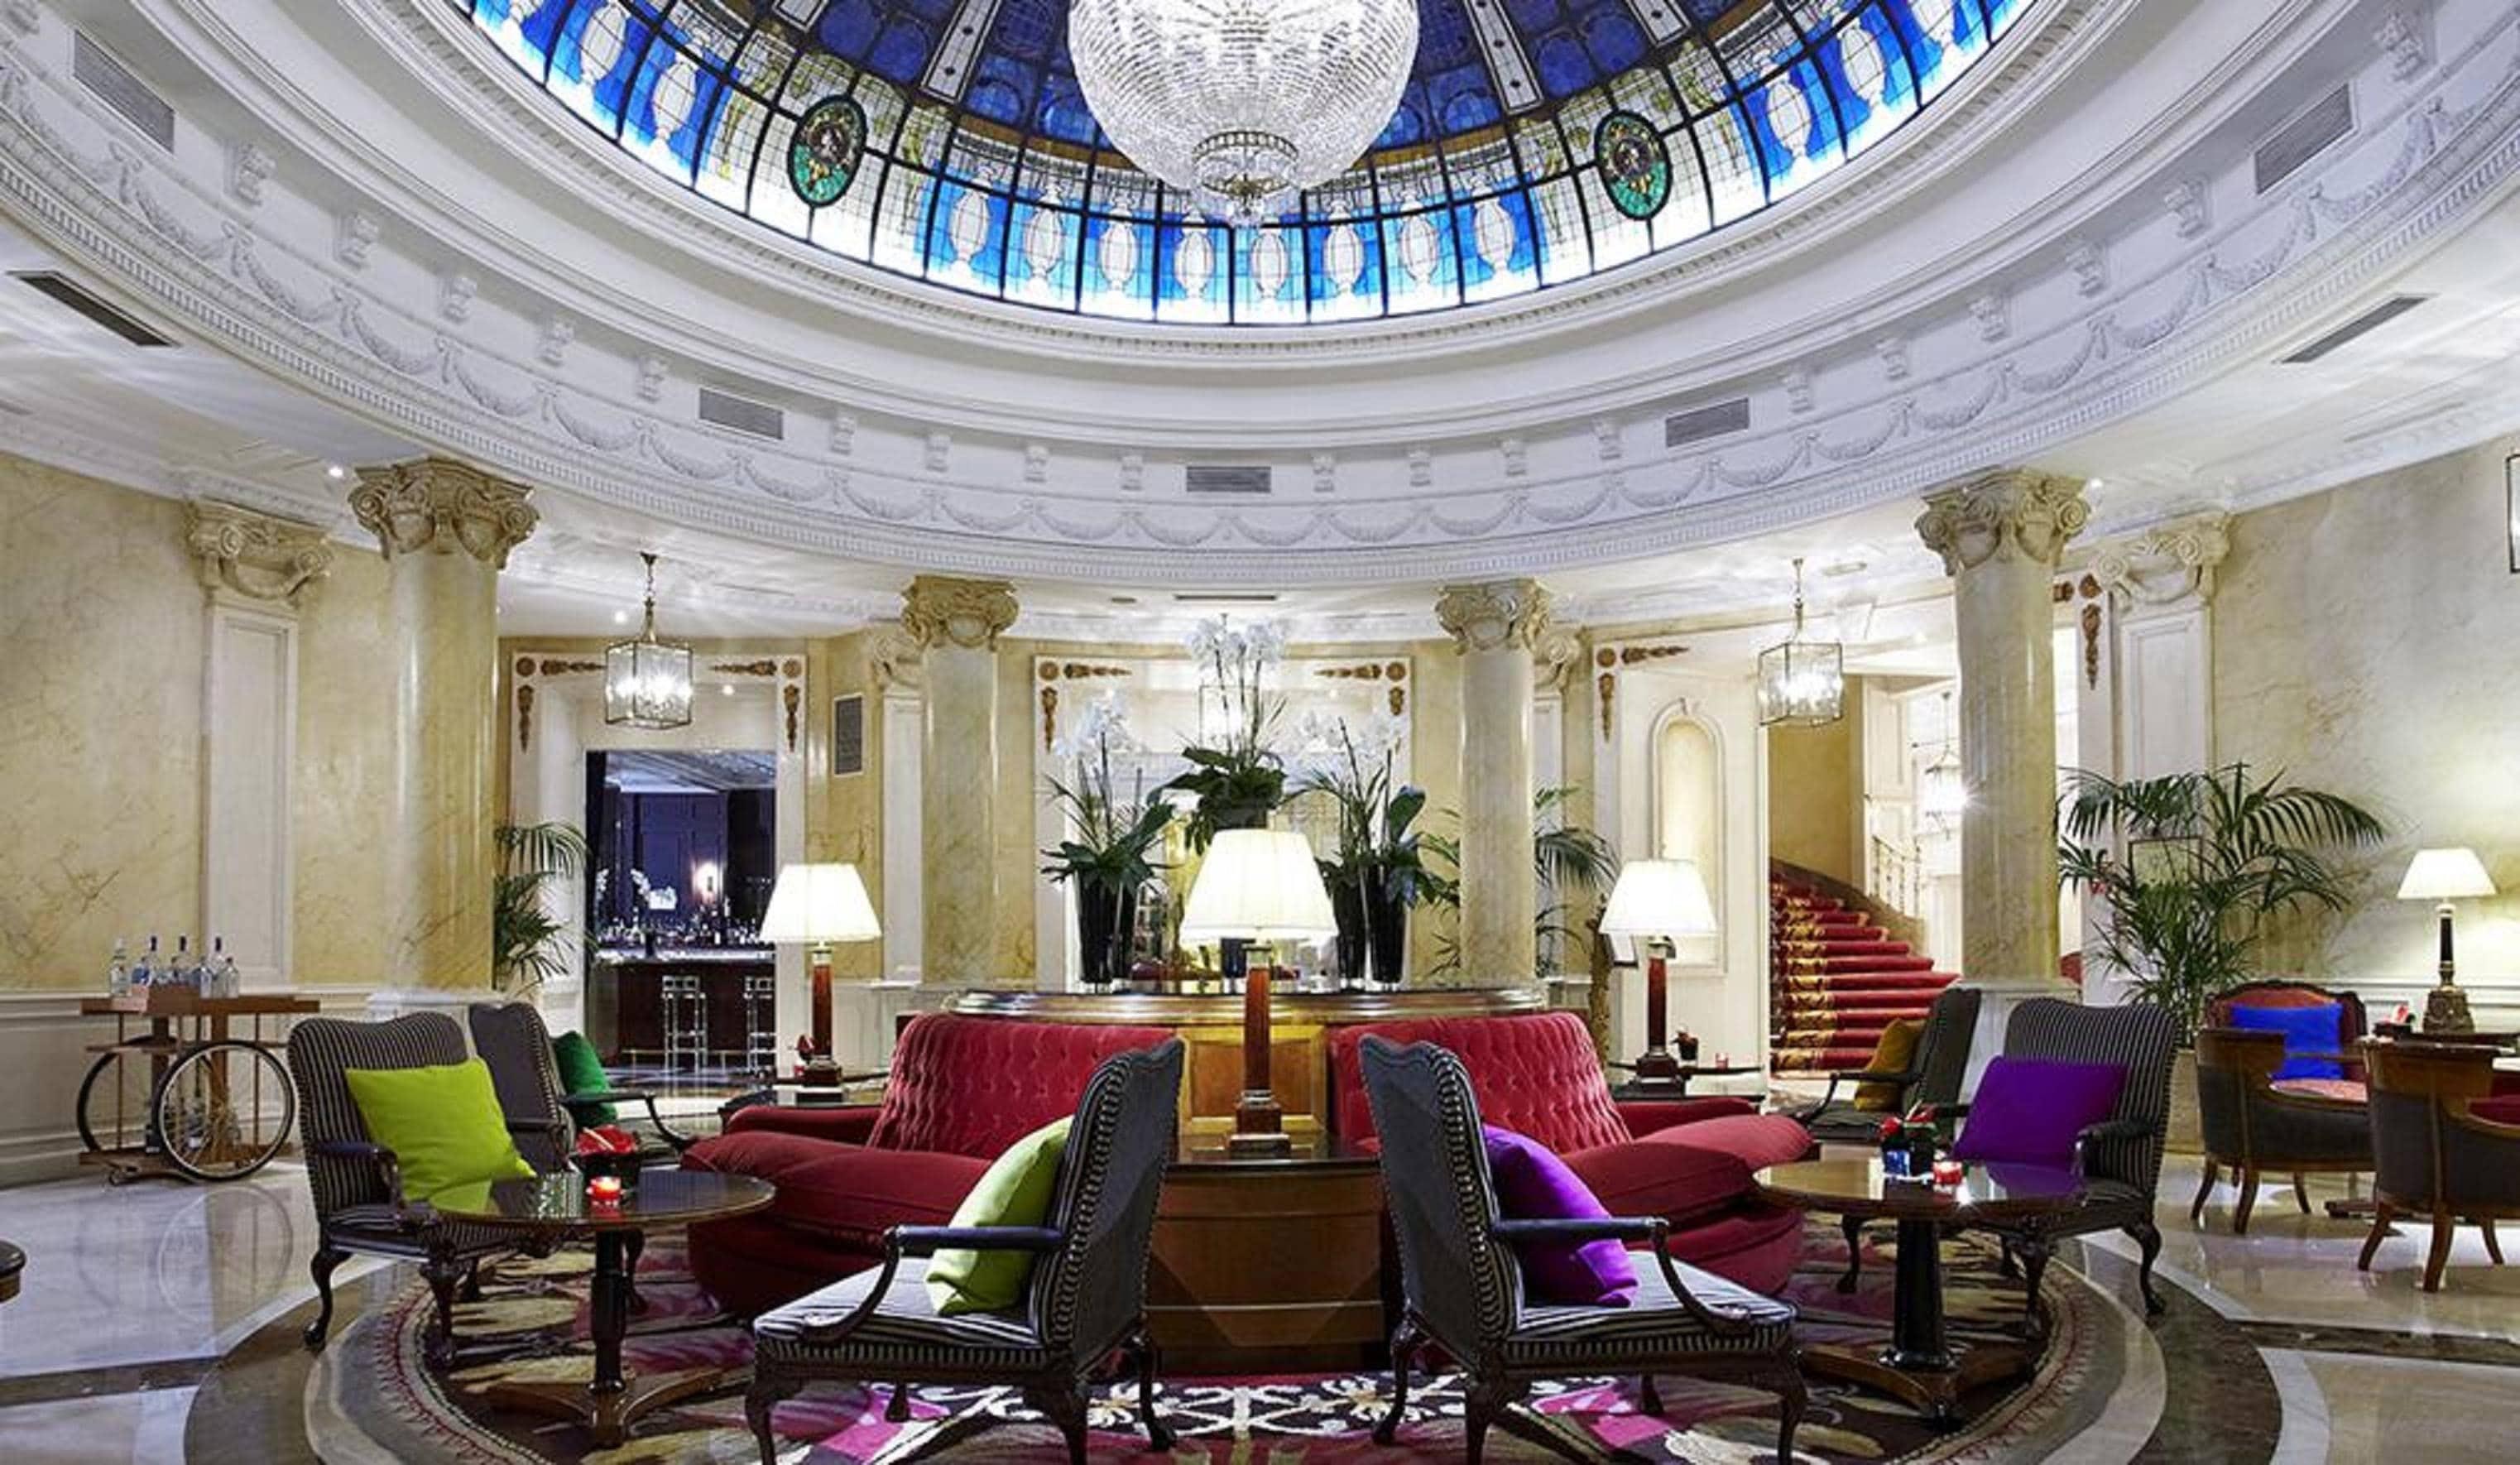 More celebs the best hotels for celebrity spotting for Gran melia hotel